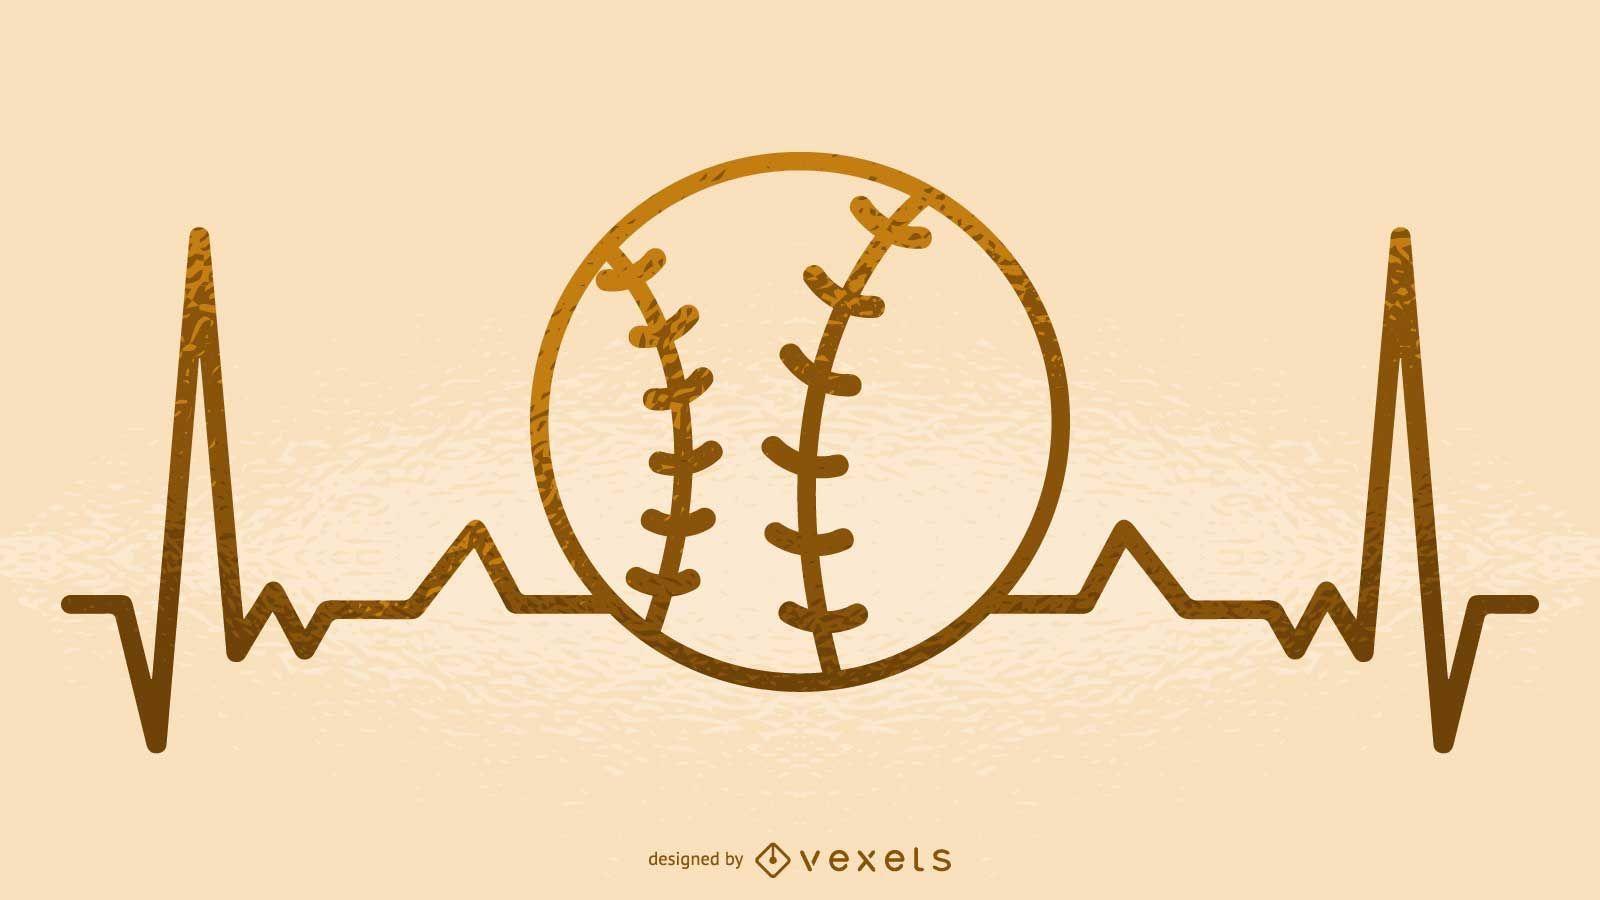 Baseball heartbeat illustration